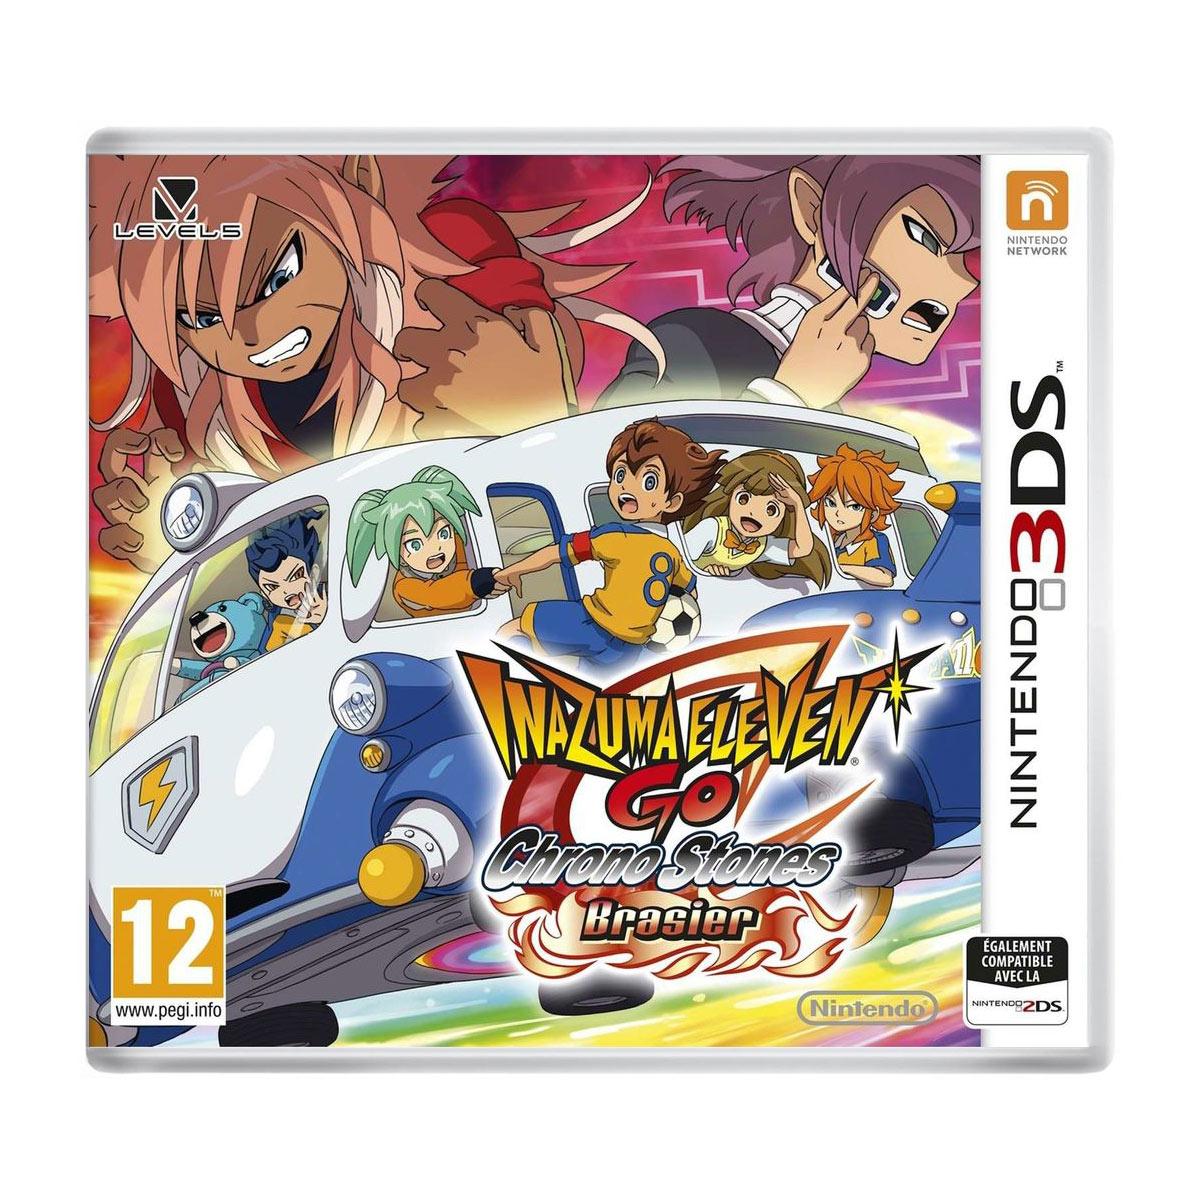 Jeux Nintendo 3DS Inazuma Eleven Go Chronos Stone : Brasier (Nintendo 3DS/2DS) Inazuma Eleven Go Chronos Stone : Brasier (Nintendo 3DS/2DS)